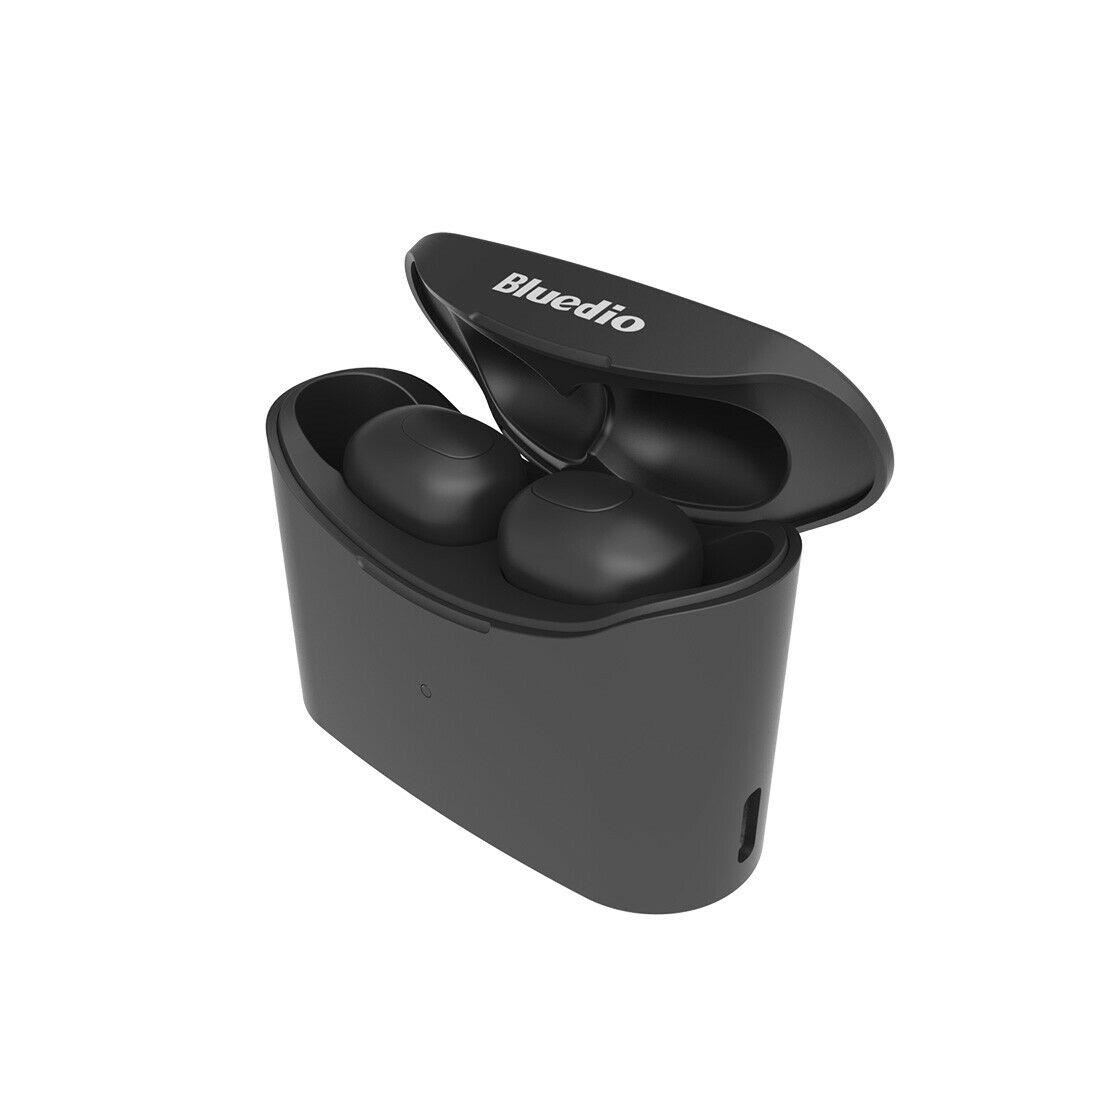 T-elf TWS Bluetooth 5.0 Sports Wireless Earphones with Charging Box black